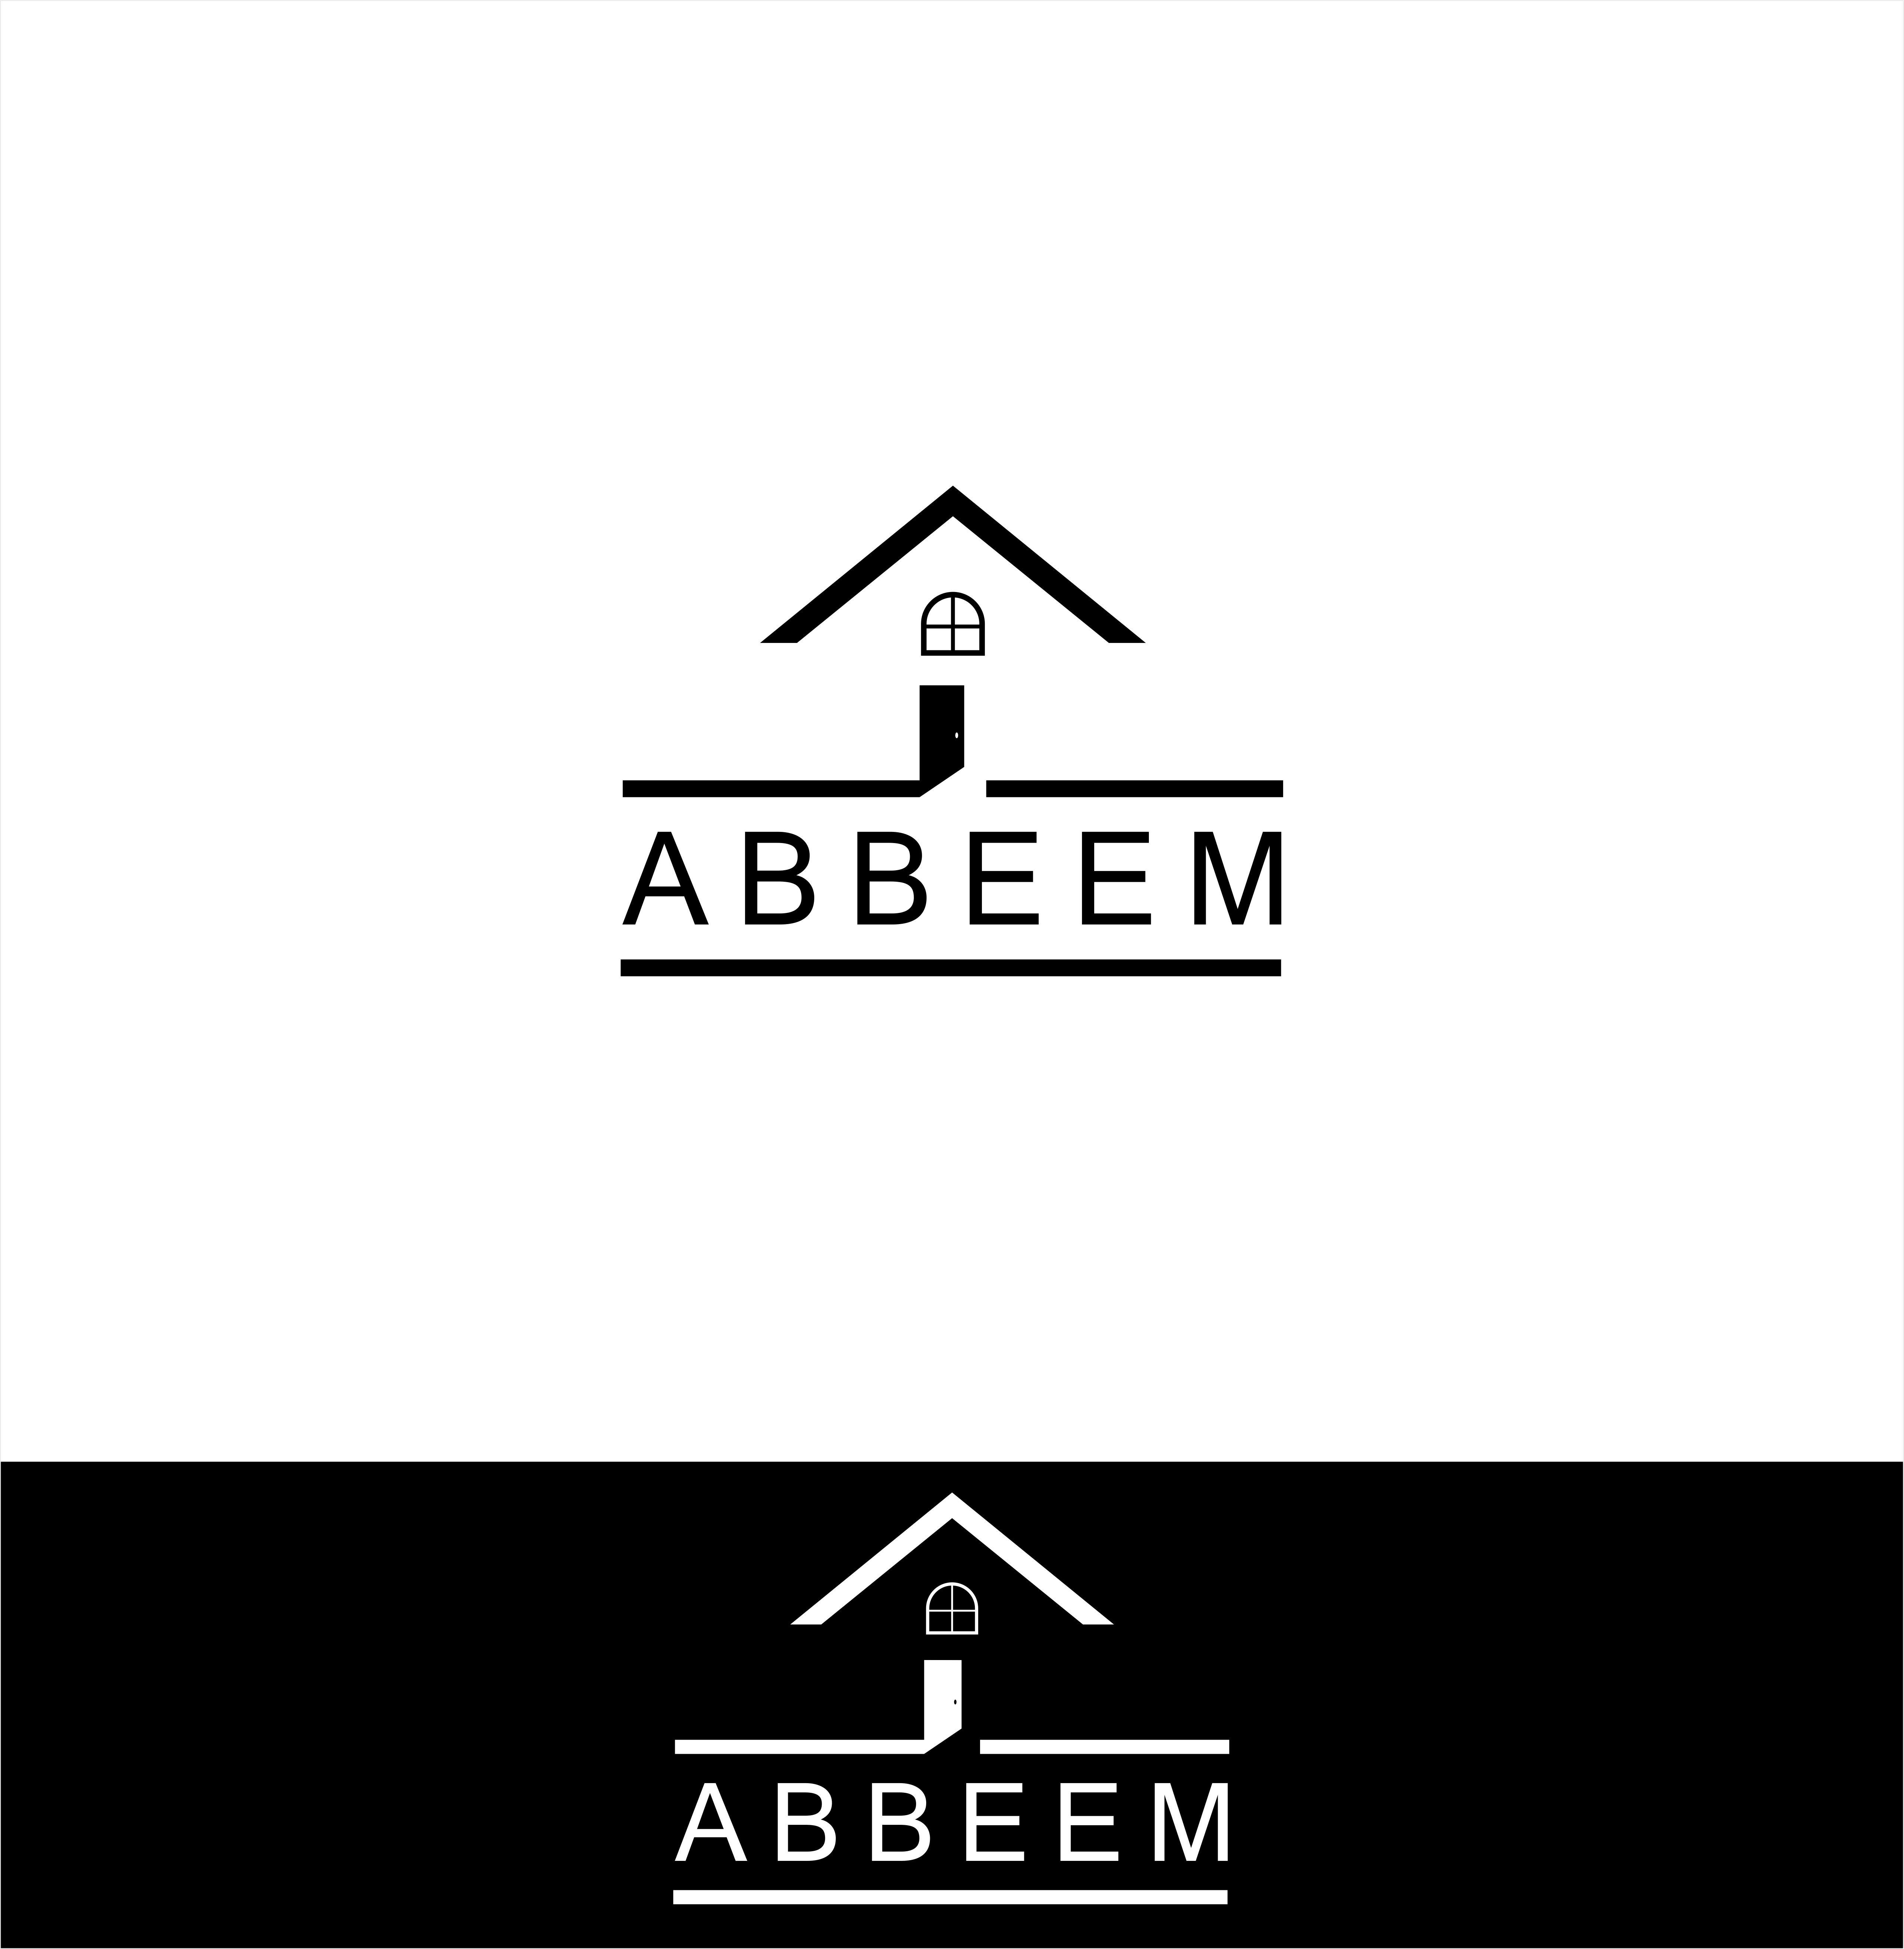 Logo Design by snow - Entry No. 105 in the Logo Design Contest Luxury Logo Design for Abbeem.